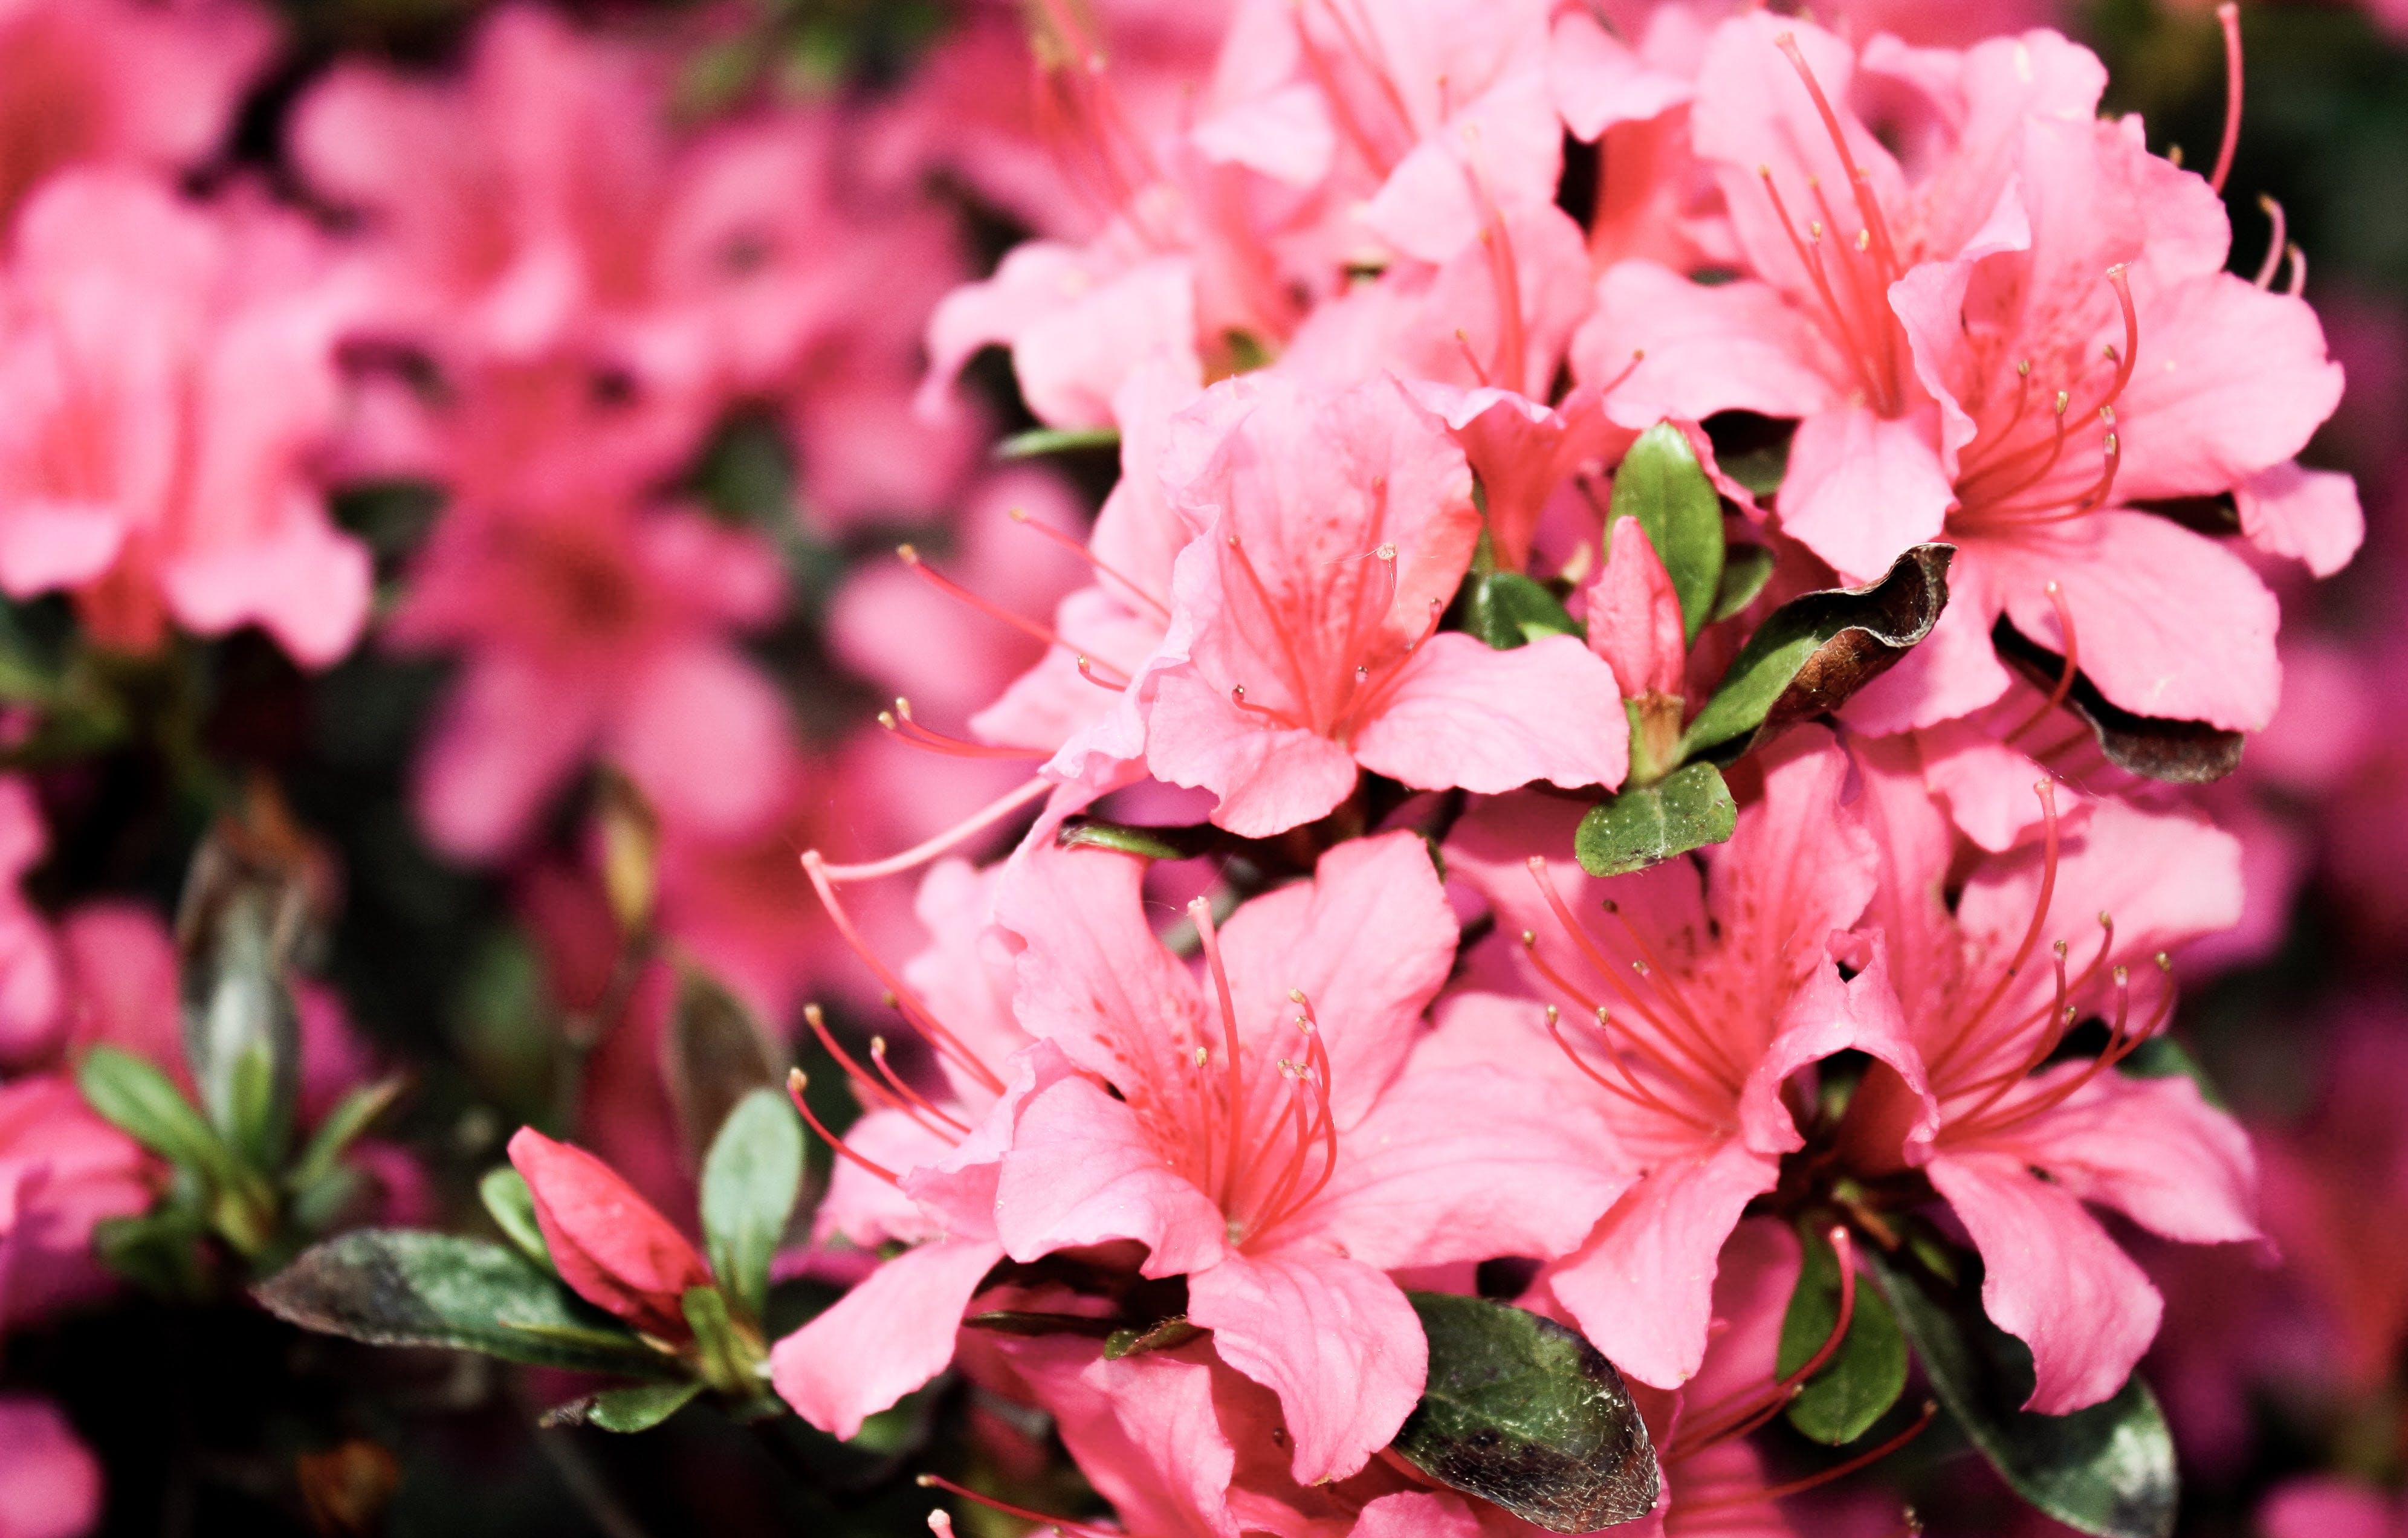 Free stock photo of flowers, garden, petals, color